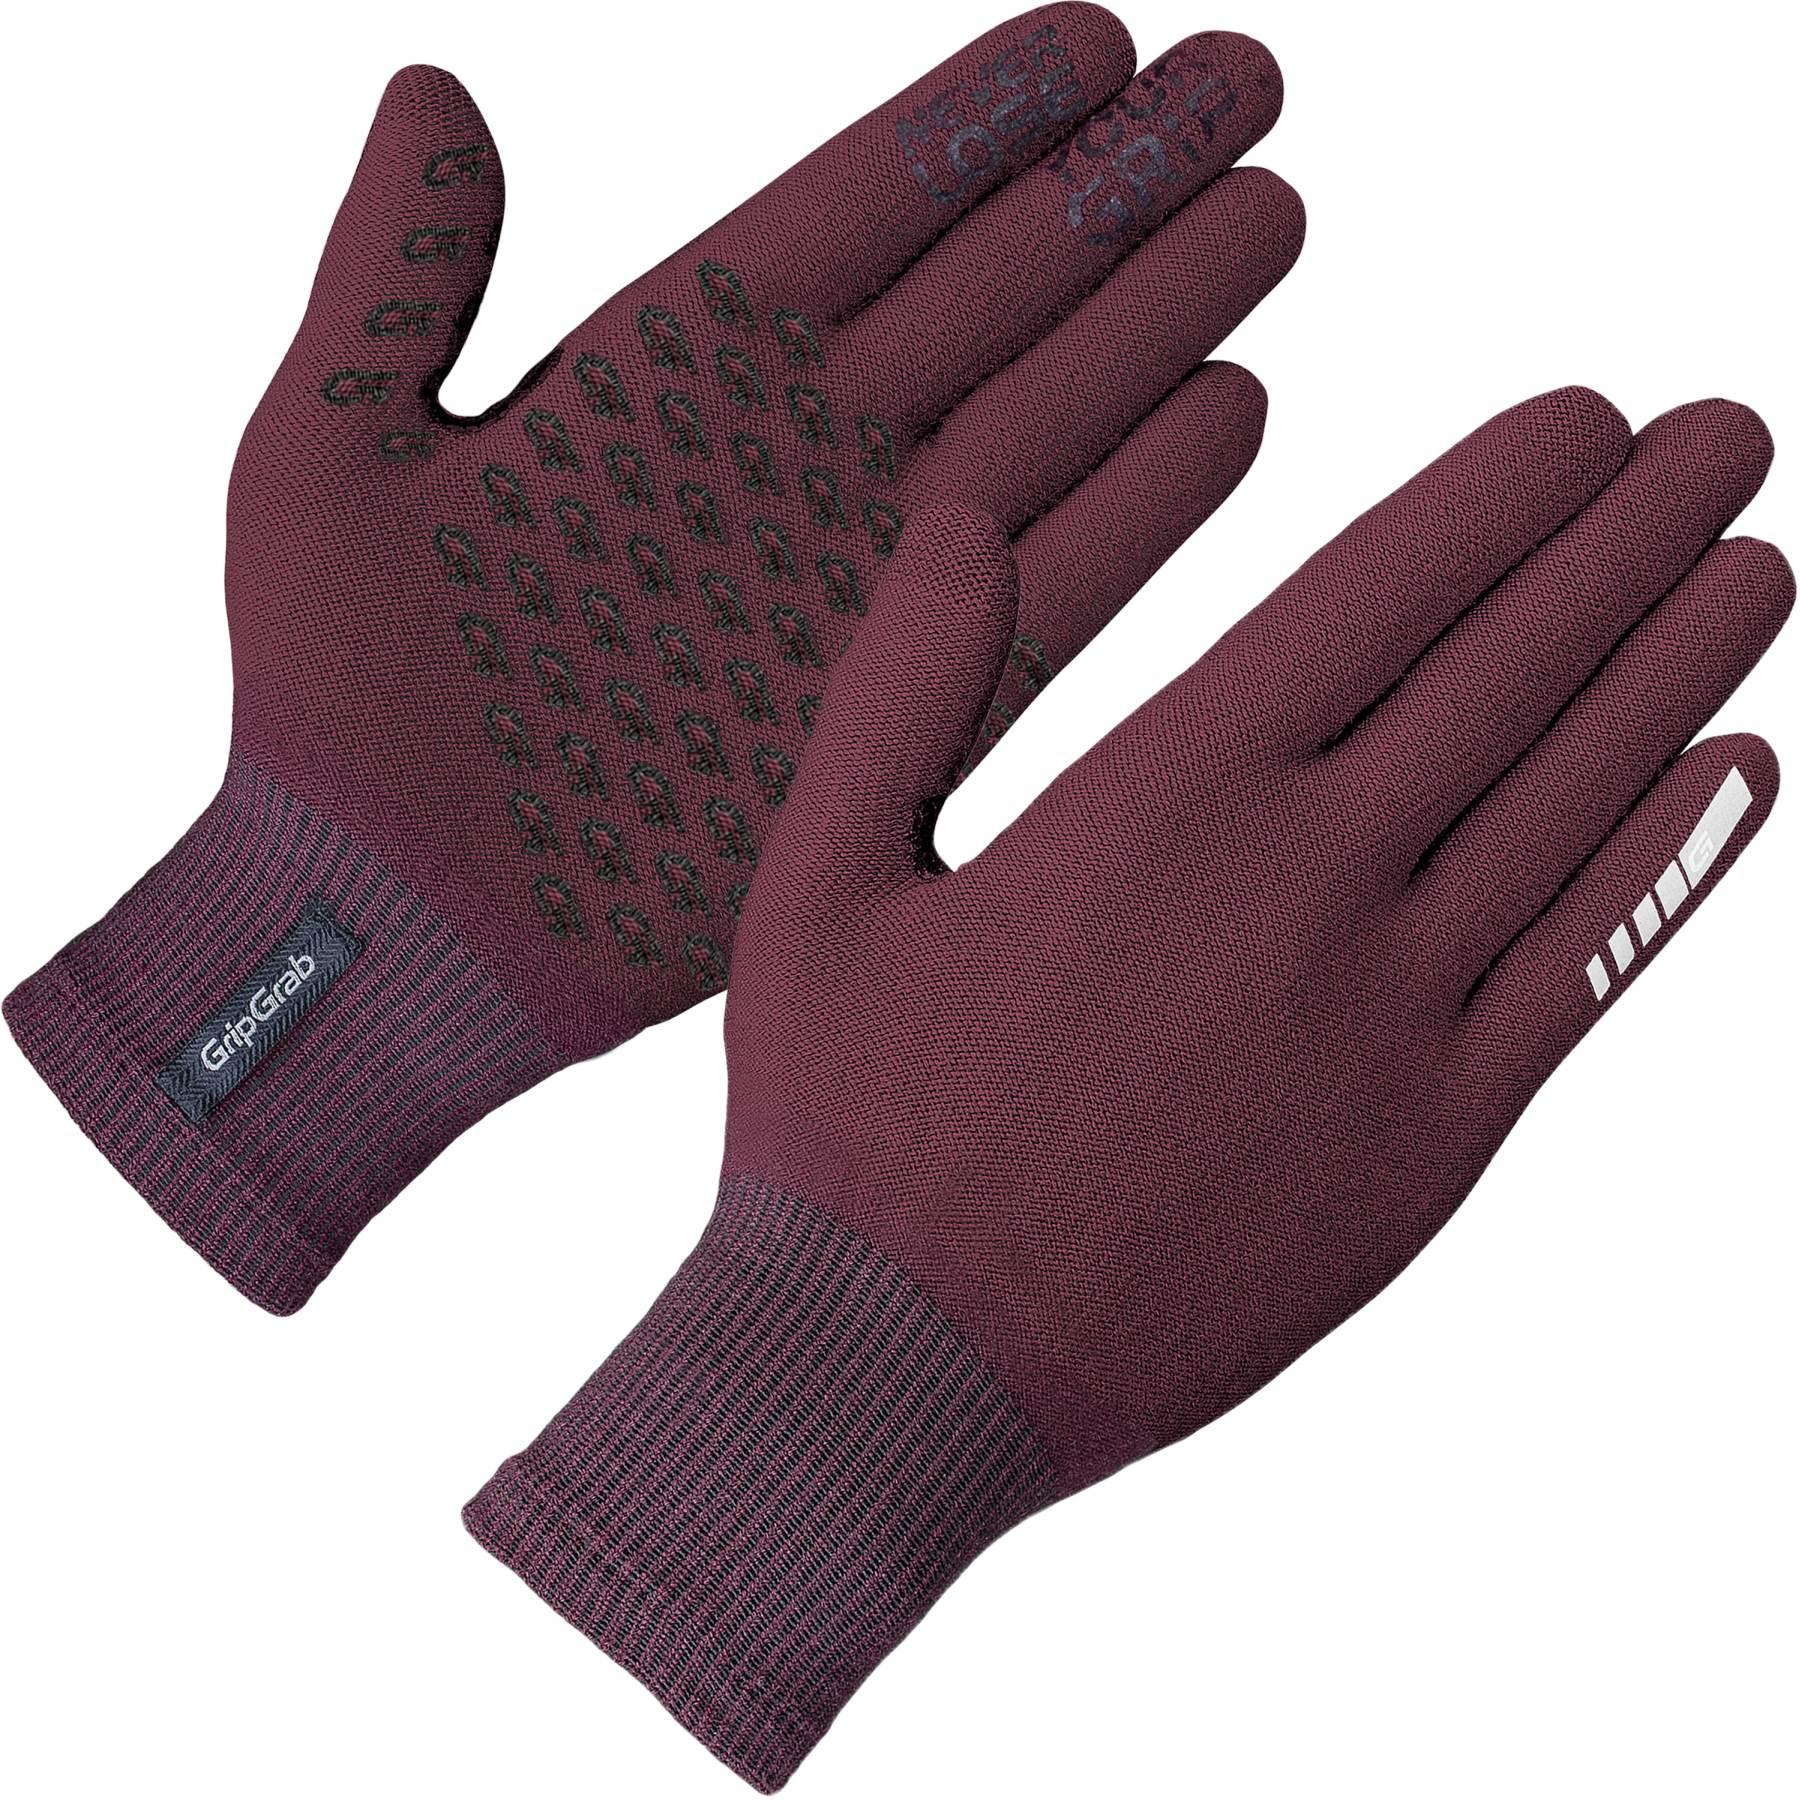 GripGrab Primavera Merino Midseason Glove II - Dark Red